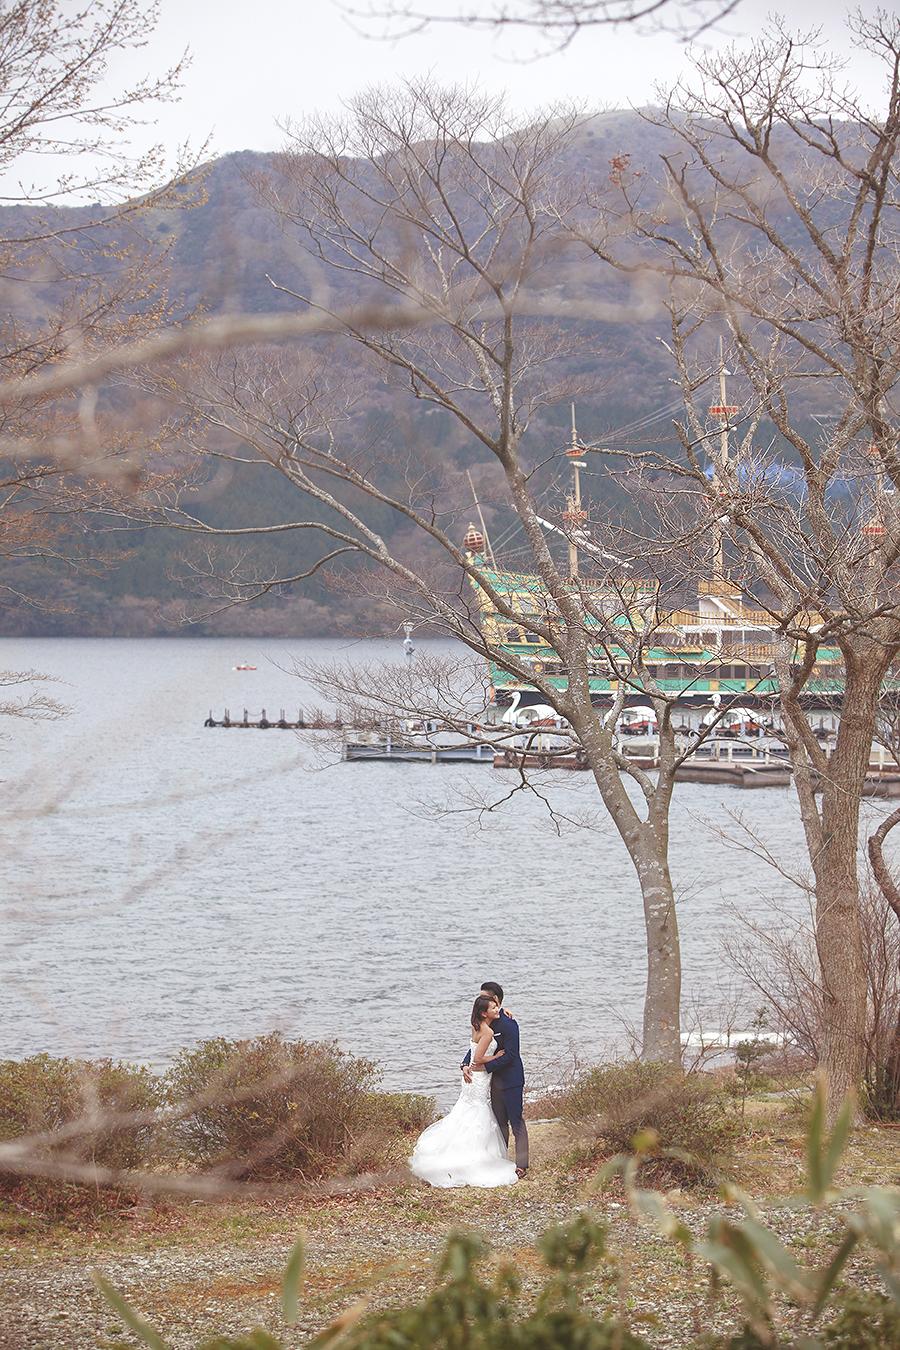 tokyo hakone japan spring sakura . engagement wedding photography by kurt ahs . ns + eu . 0374.jpg